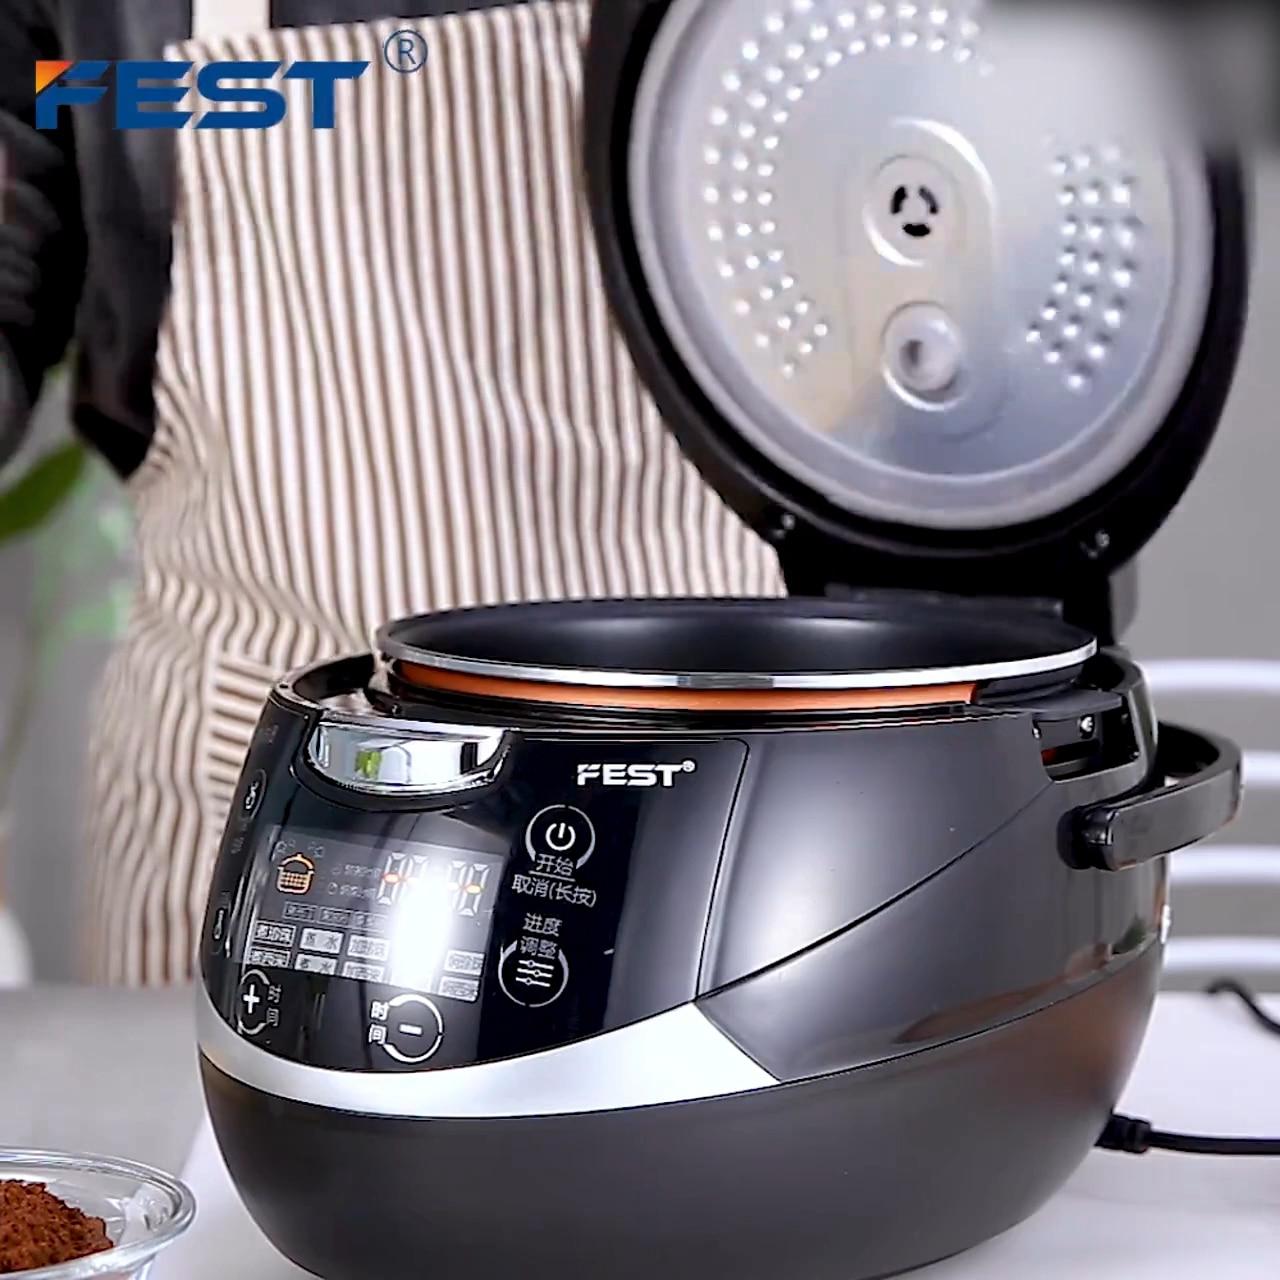 FEST 5L كامل التلقائي الذكية شاي فقاعات طباخ بوبا لؤلؤة طباخ آلة لمتجر الشاي الحليب